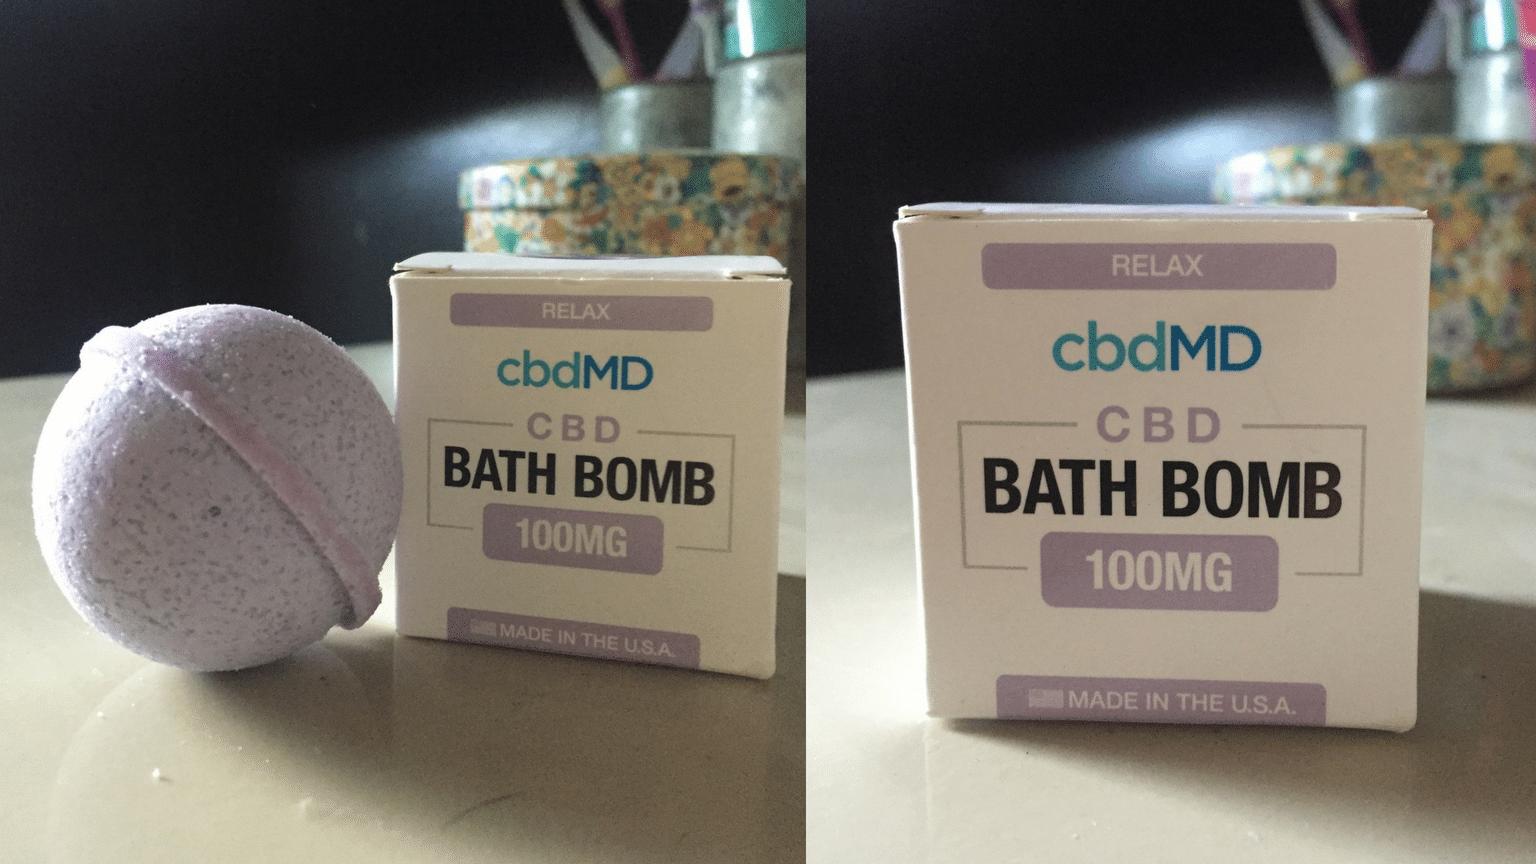 cbmd-cbd-bath-bomb